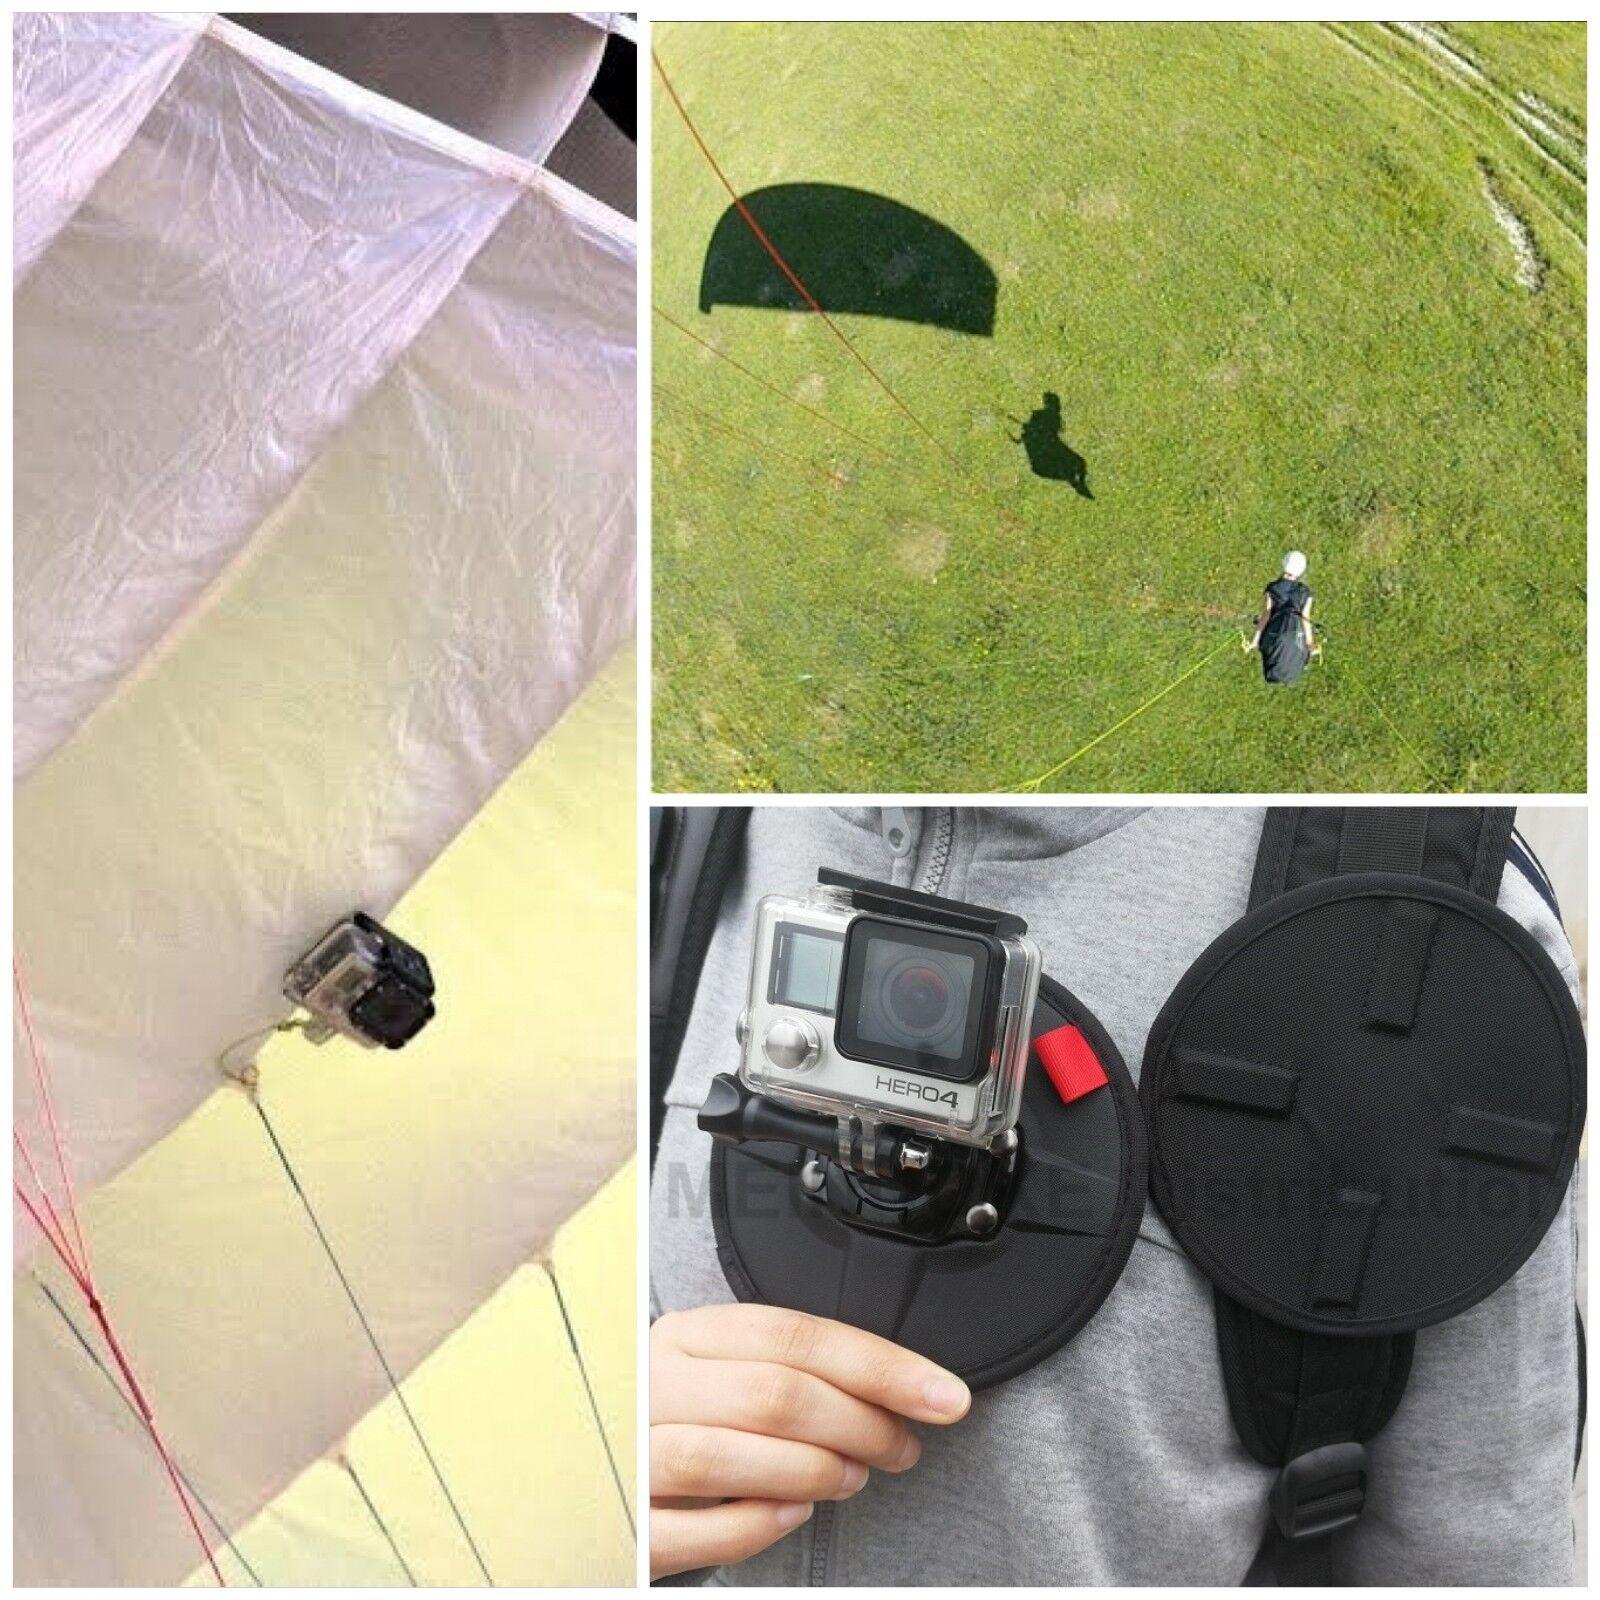 Neuf Sport Parachute Parapente Delta Magnétique MONTER GoPRO Hero Camera EQUIPE